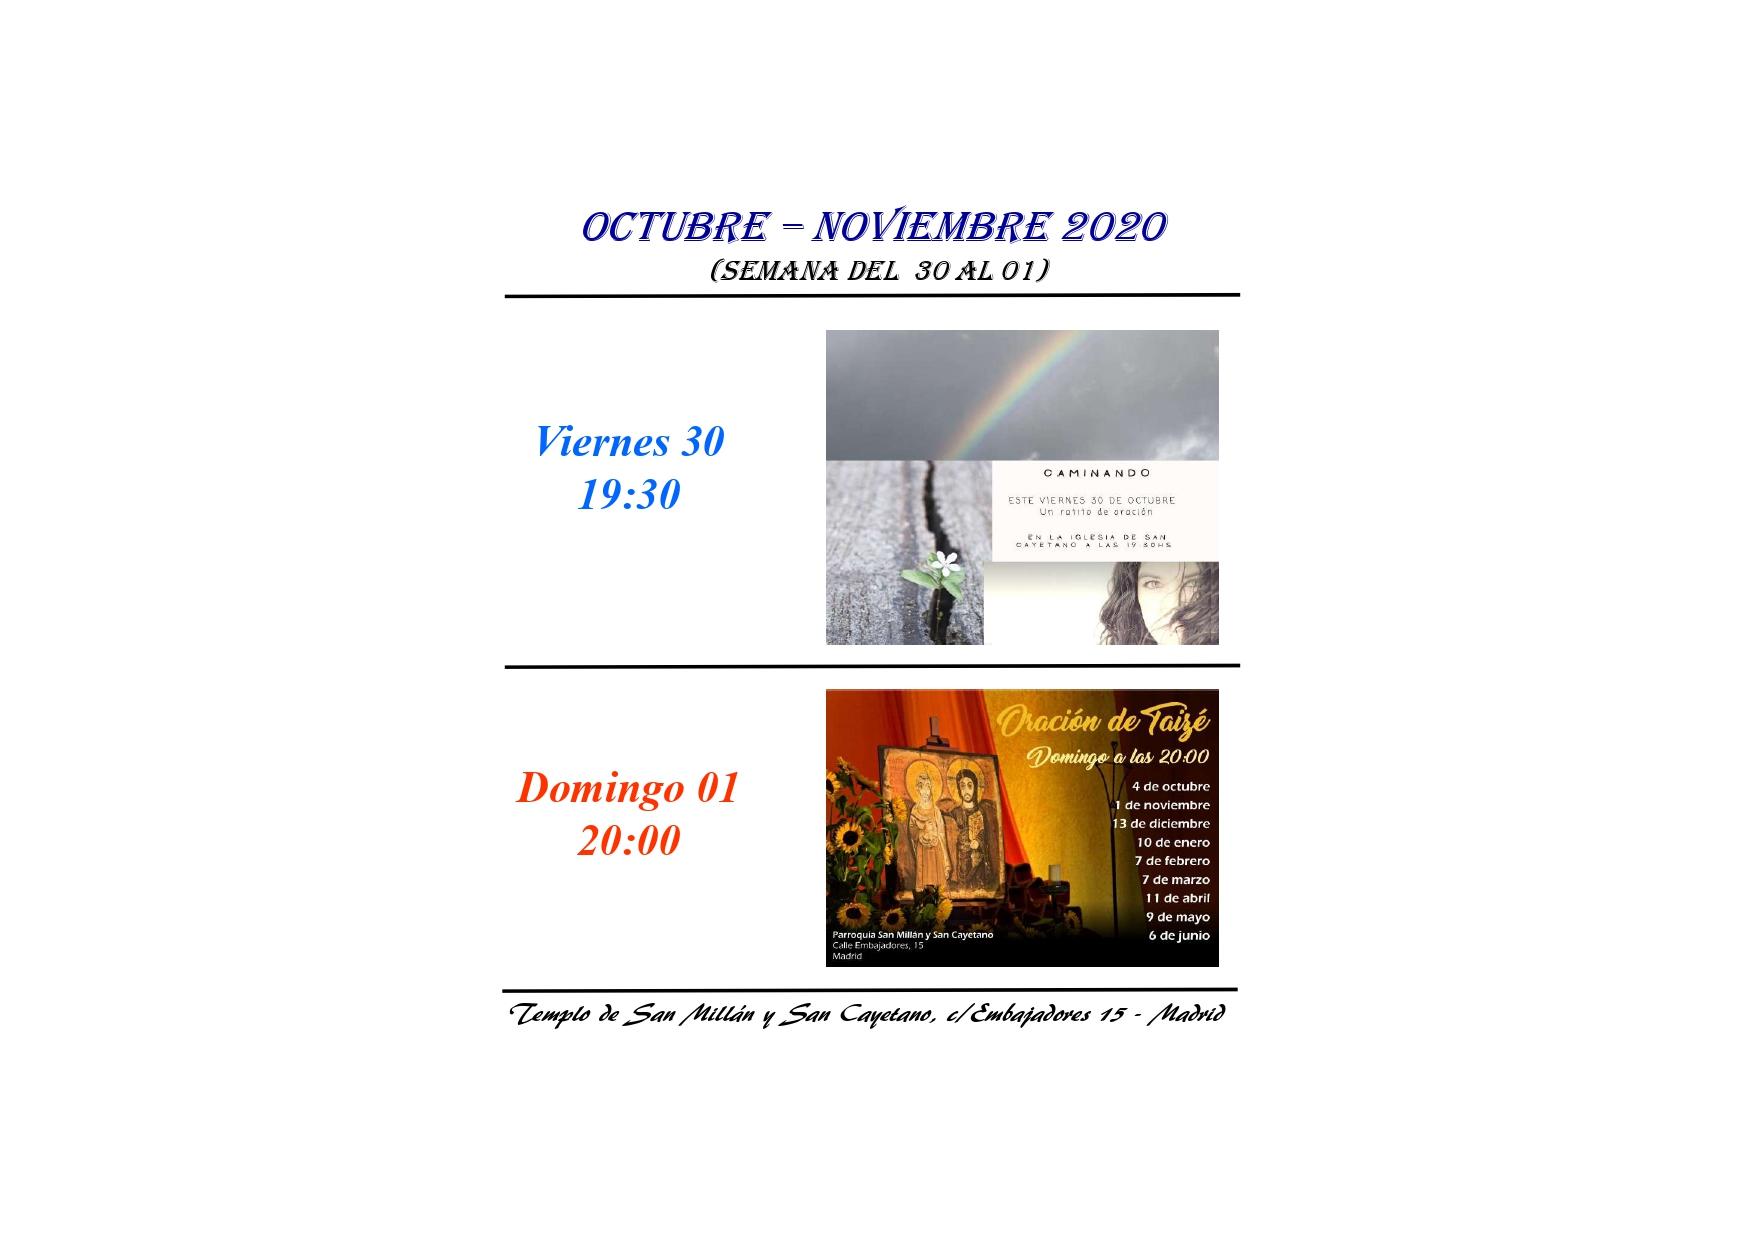 parroquia-san-millan-san-cayetano-actividades-del-30-octubre -1-noviembre